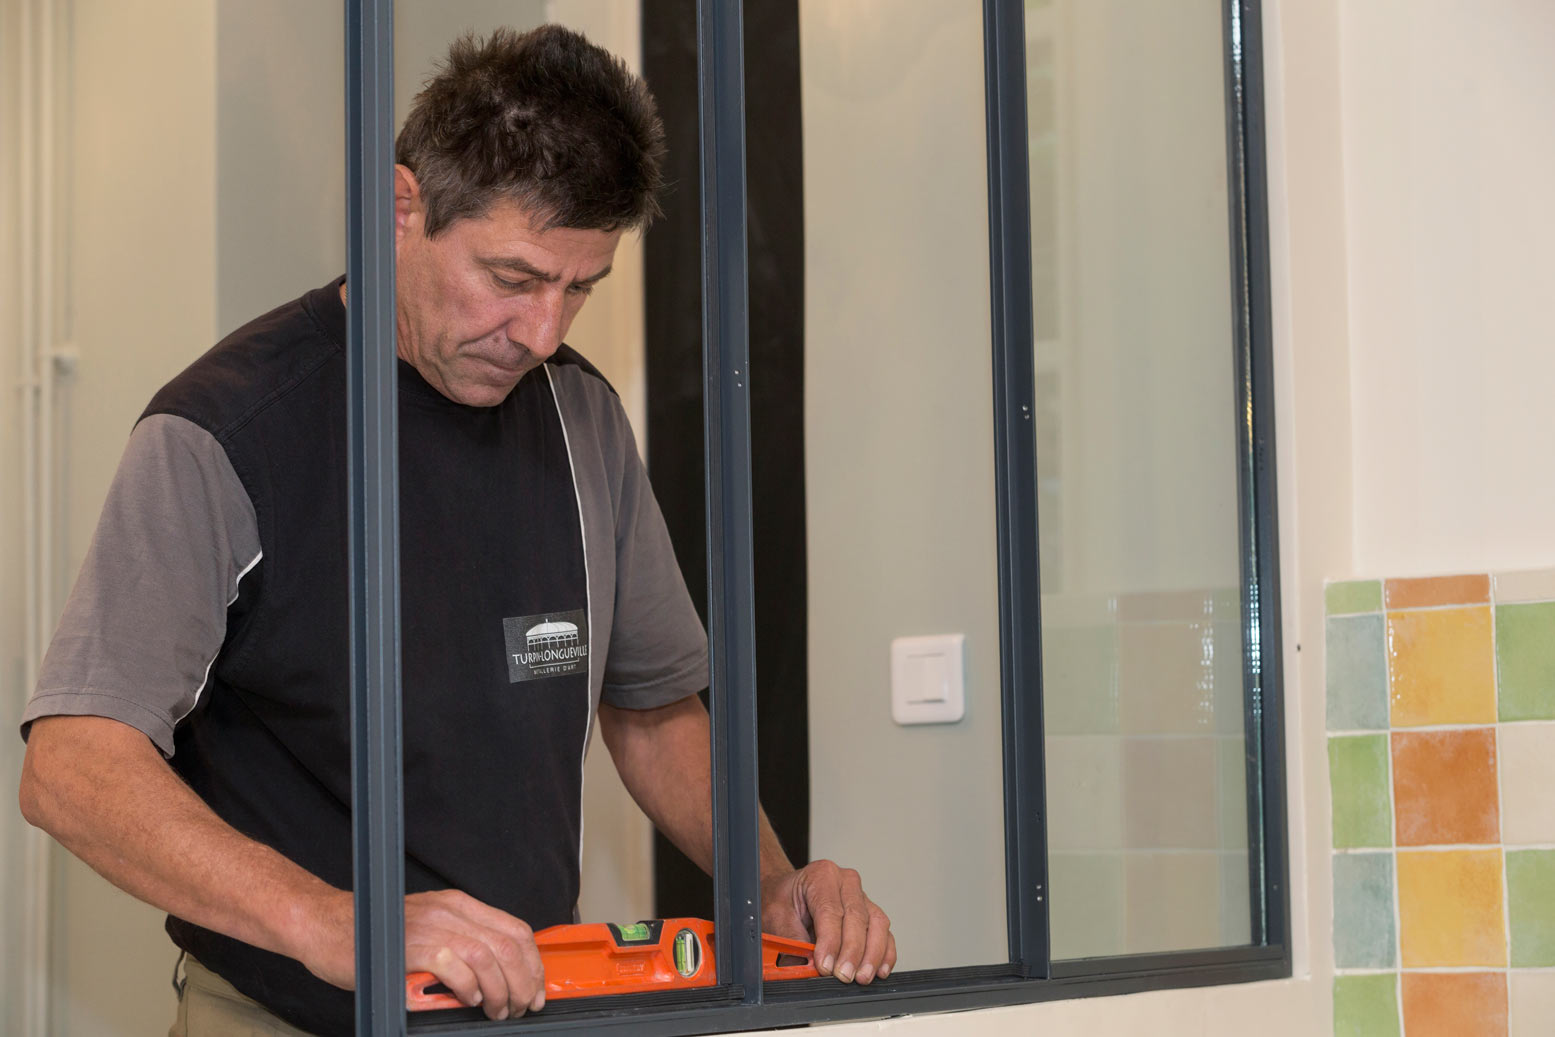 faire installer et poser une verri re cloison vitr e. Black Bedroom Furniture Sets. Home Design Ideas